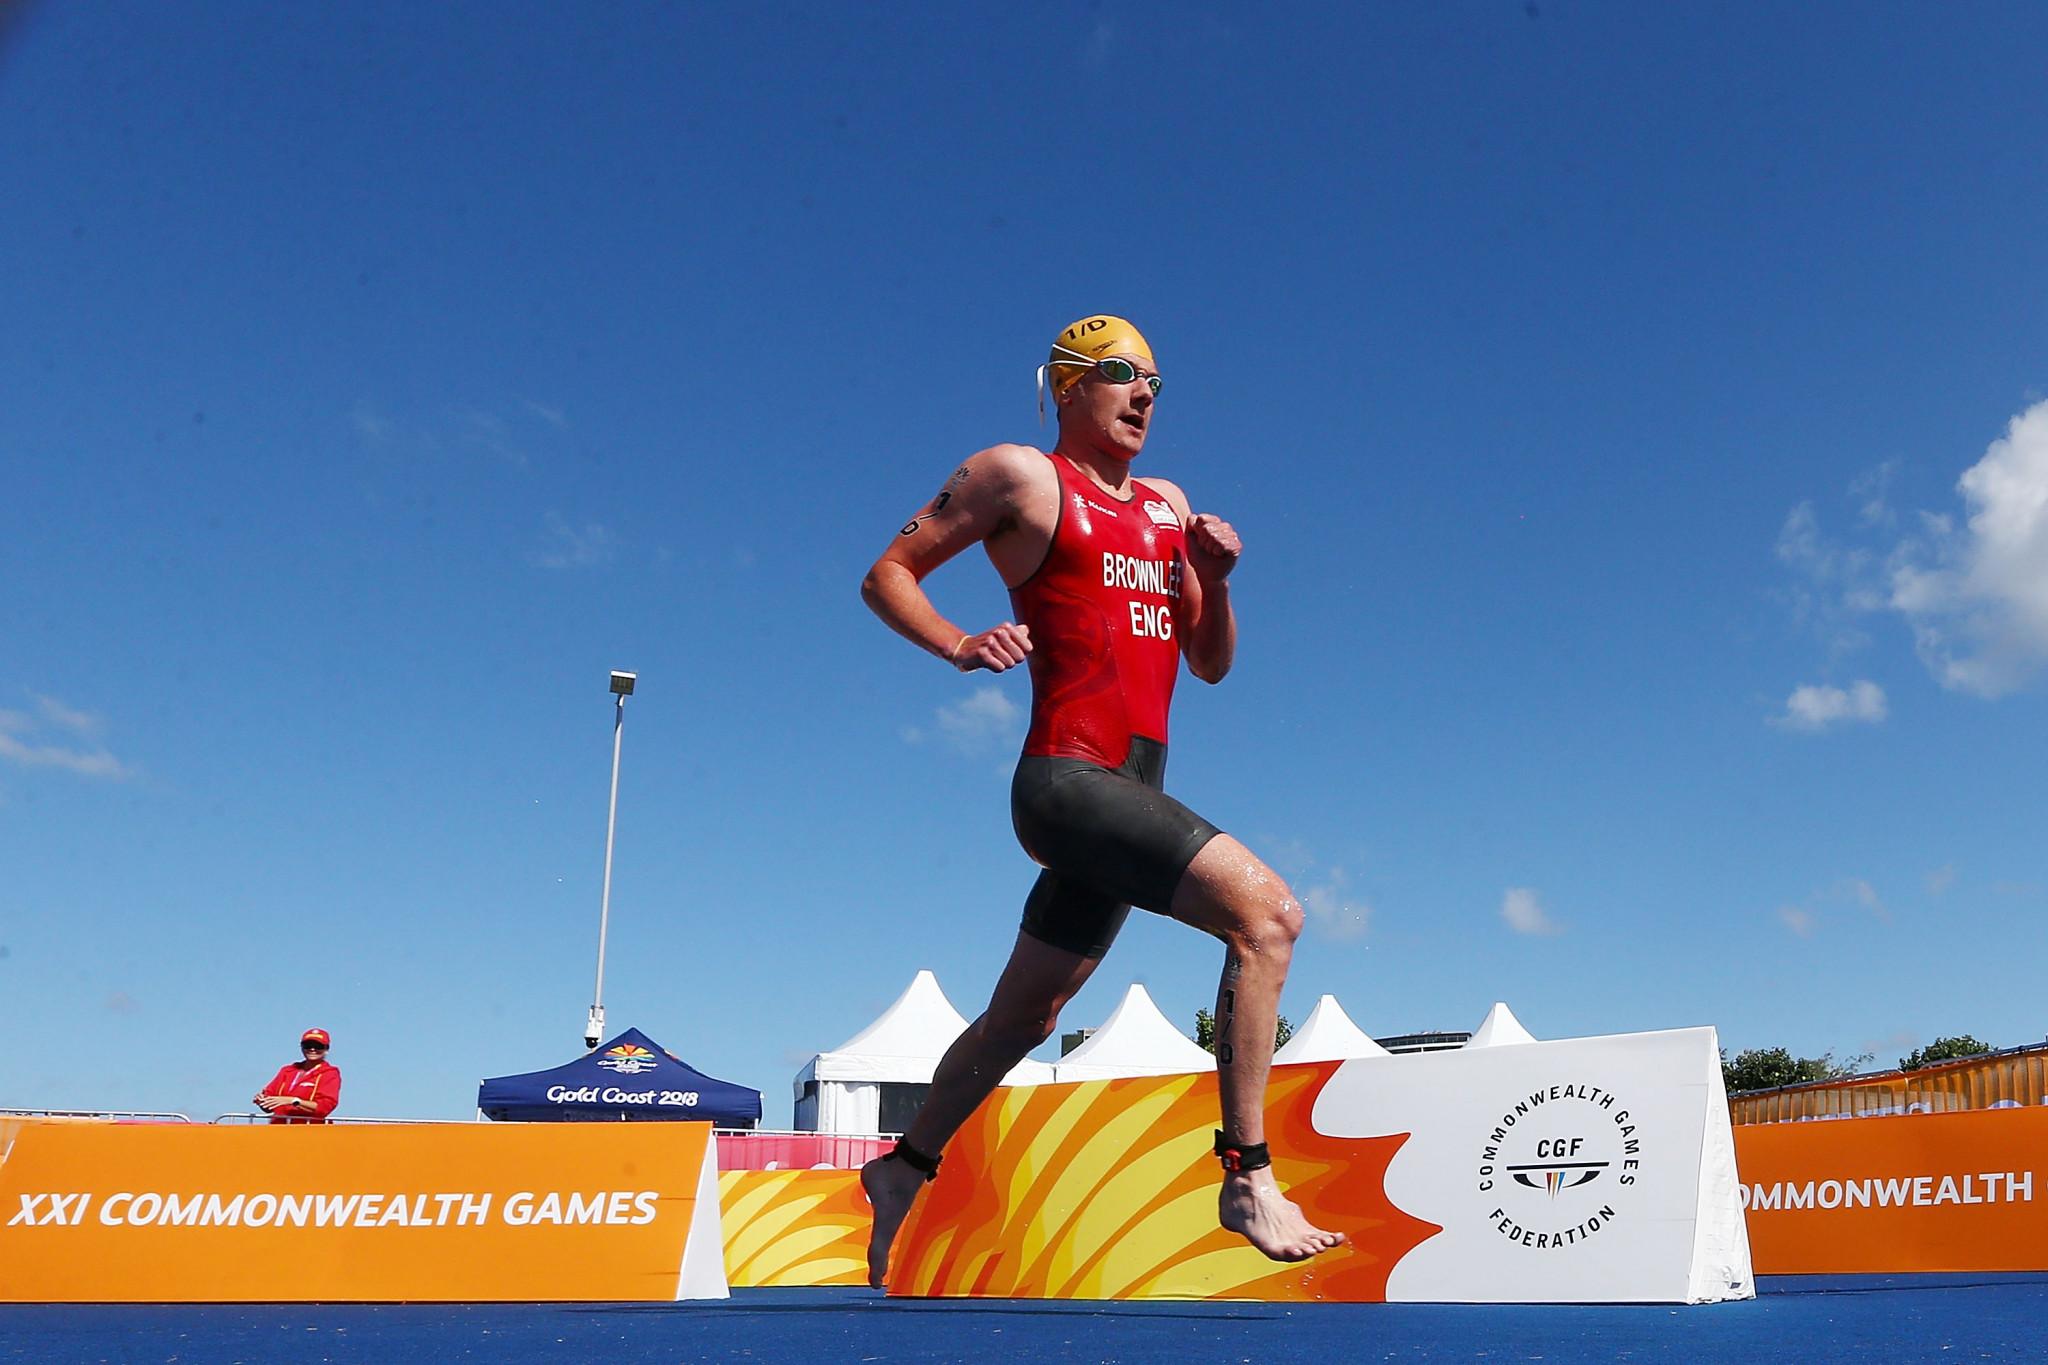 Commonwealth Games England confirm triathlon coaches for Birmingham 2022